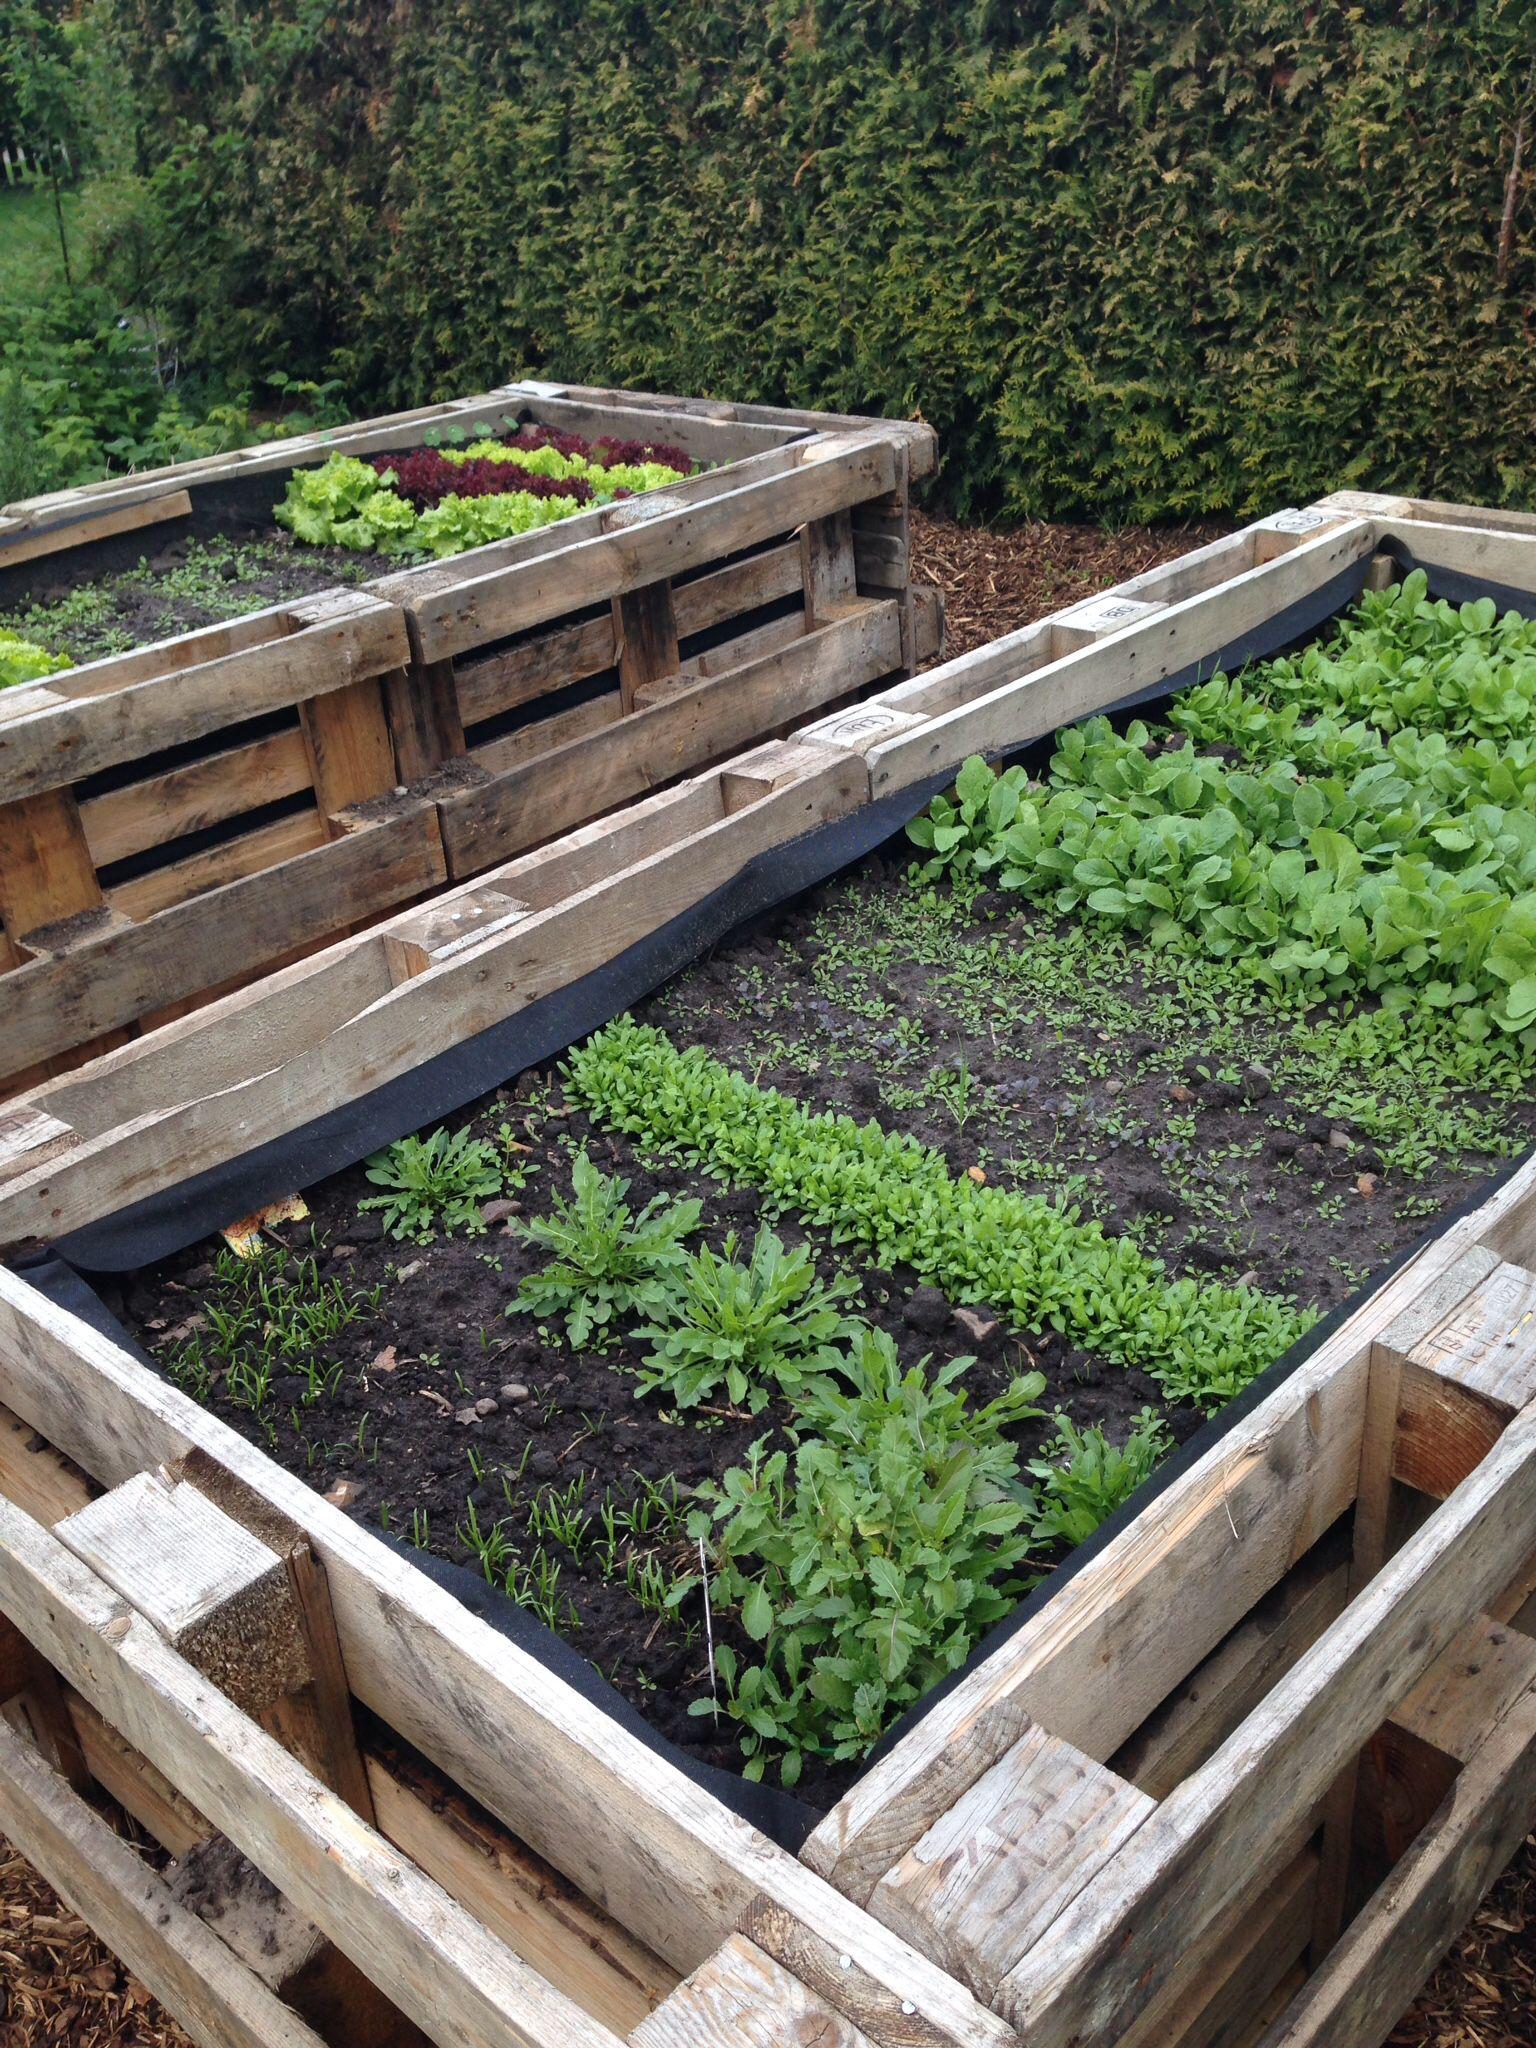 hochbeet aus europaletten garten pinterest veg garden and gardens. Black Bedroom Furniture Sets. Home Design Ideas